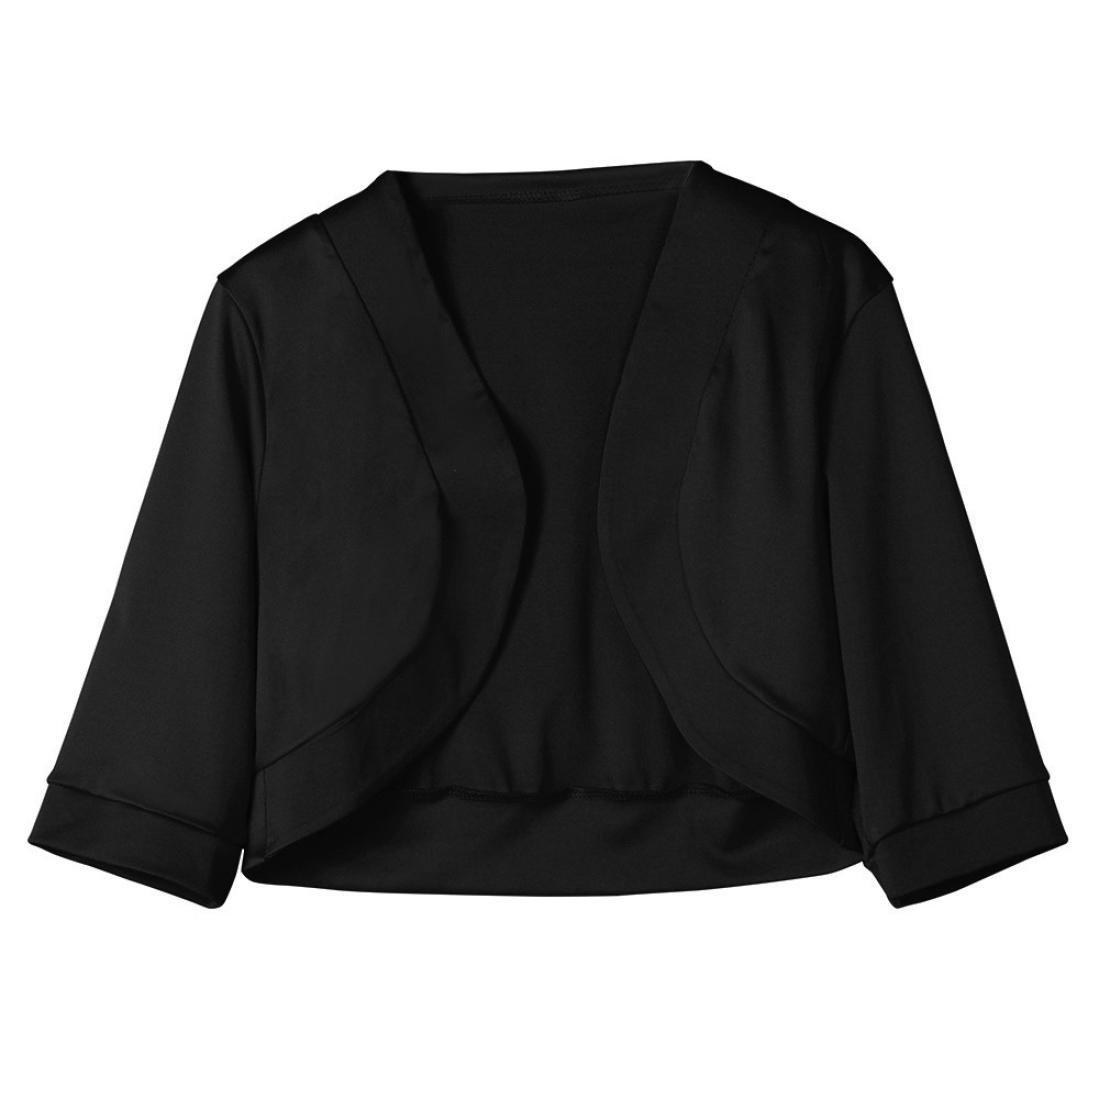 Amazon.com: FORUU womens Tops & Tees Short Cardigan, Womens Half Sleeve Solid Mini Fashion Office Work Coat FORUU: Clothing